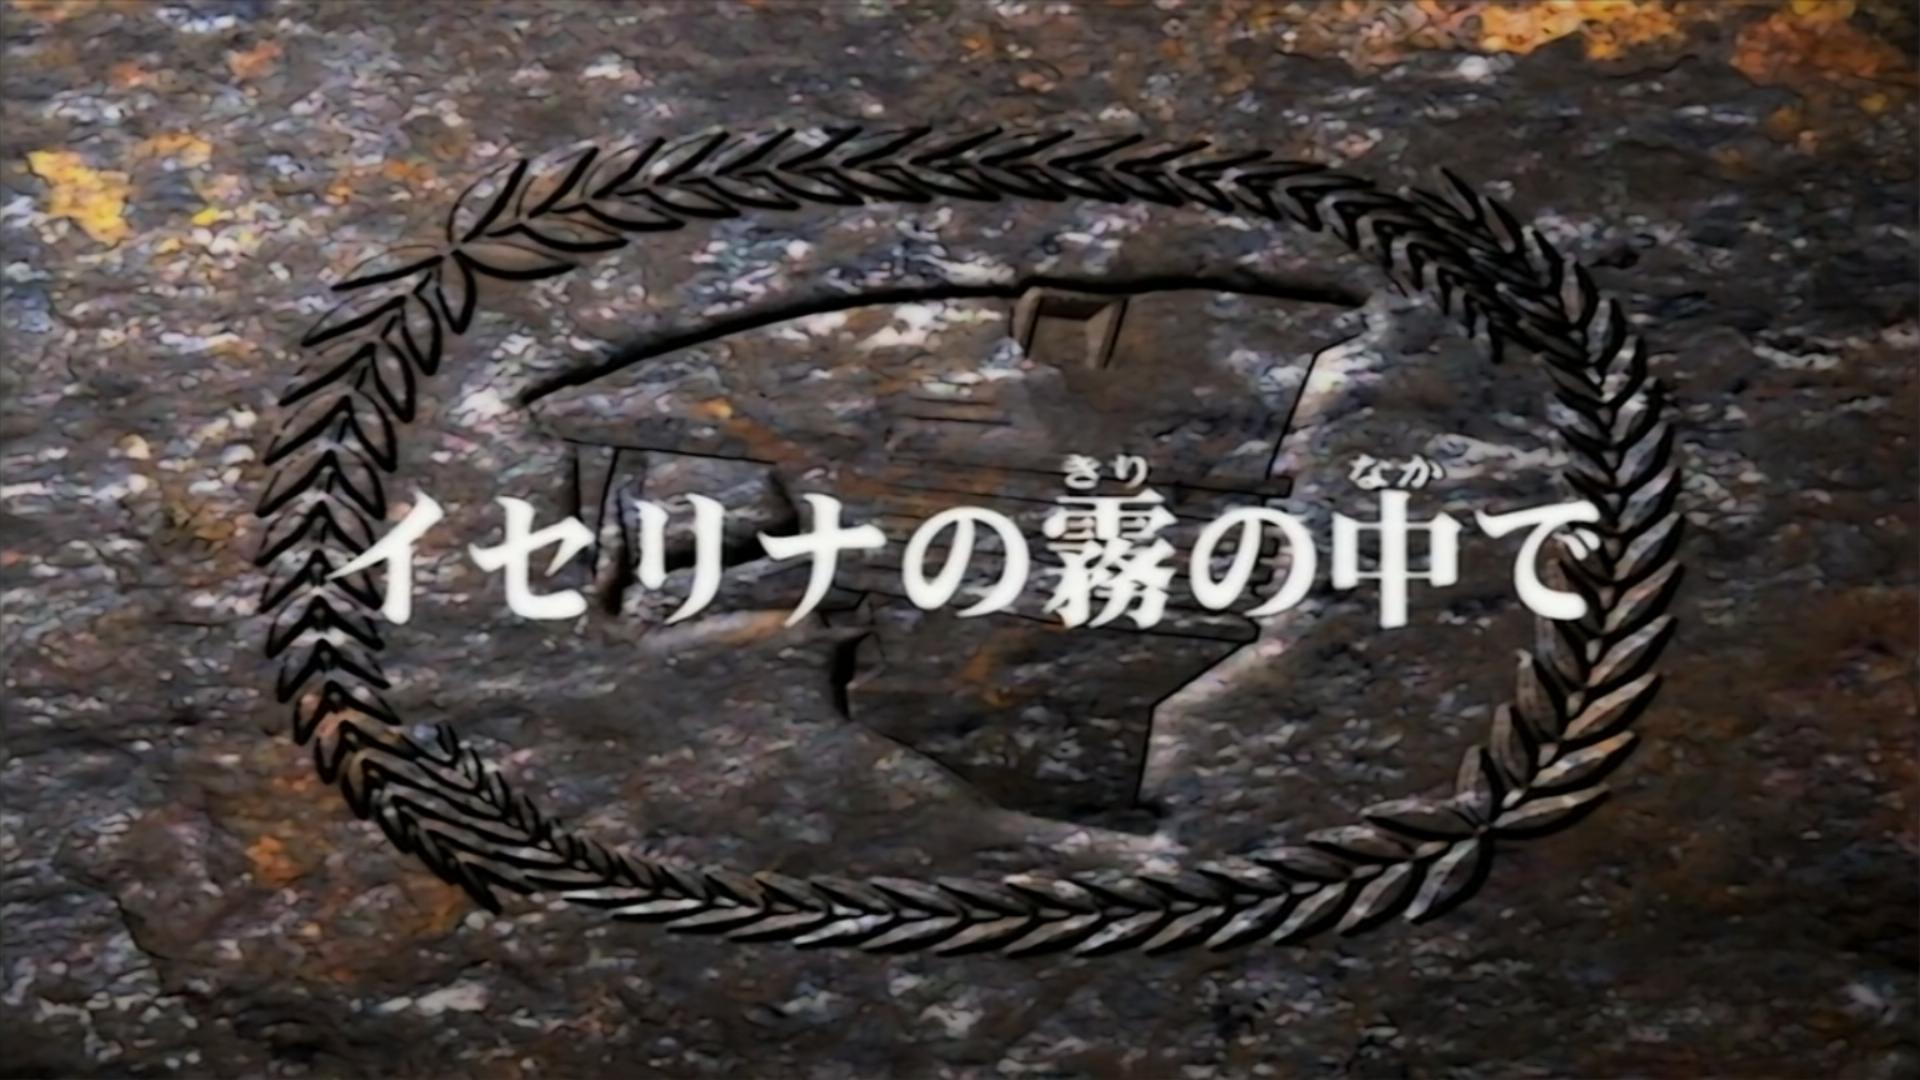 Zoids: Chaotic Century Episode 11